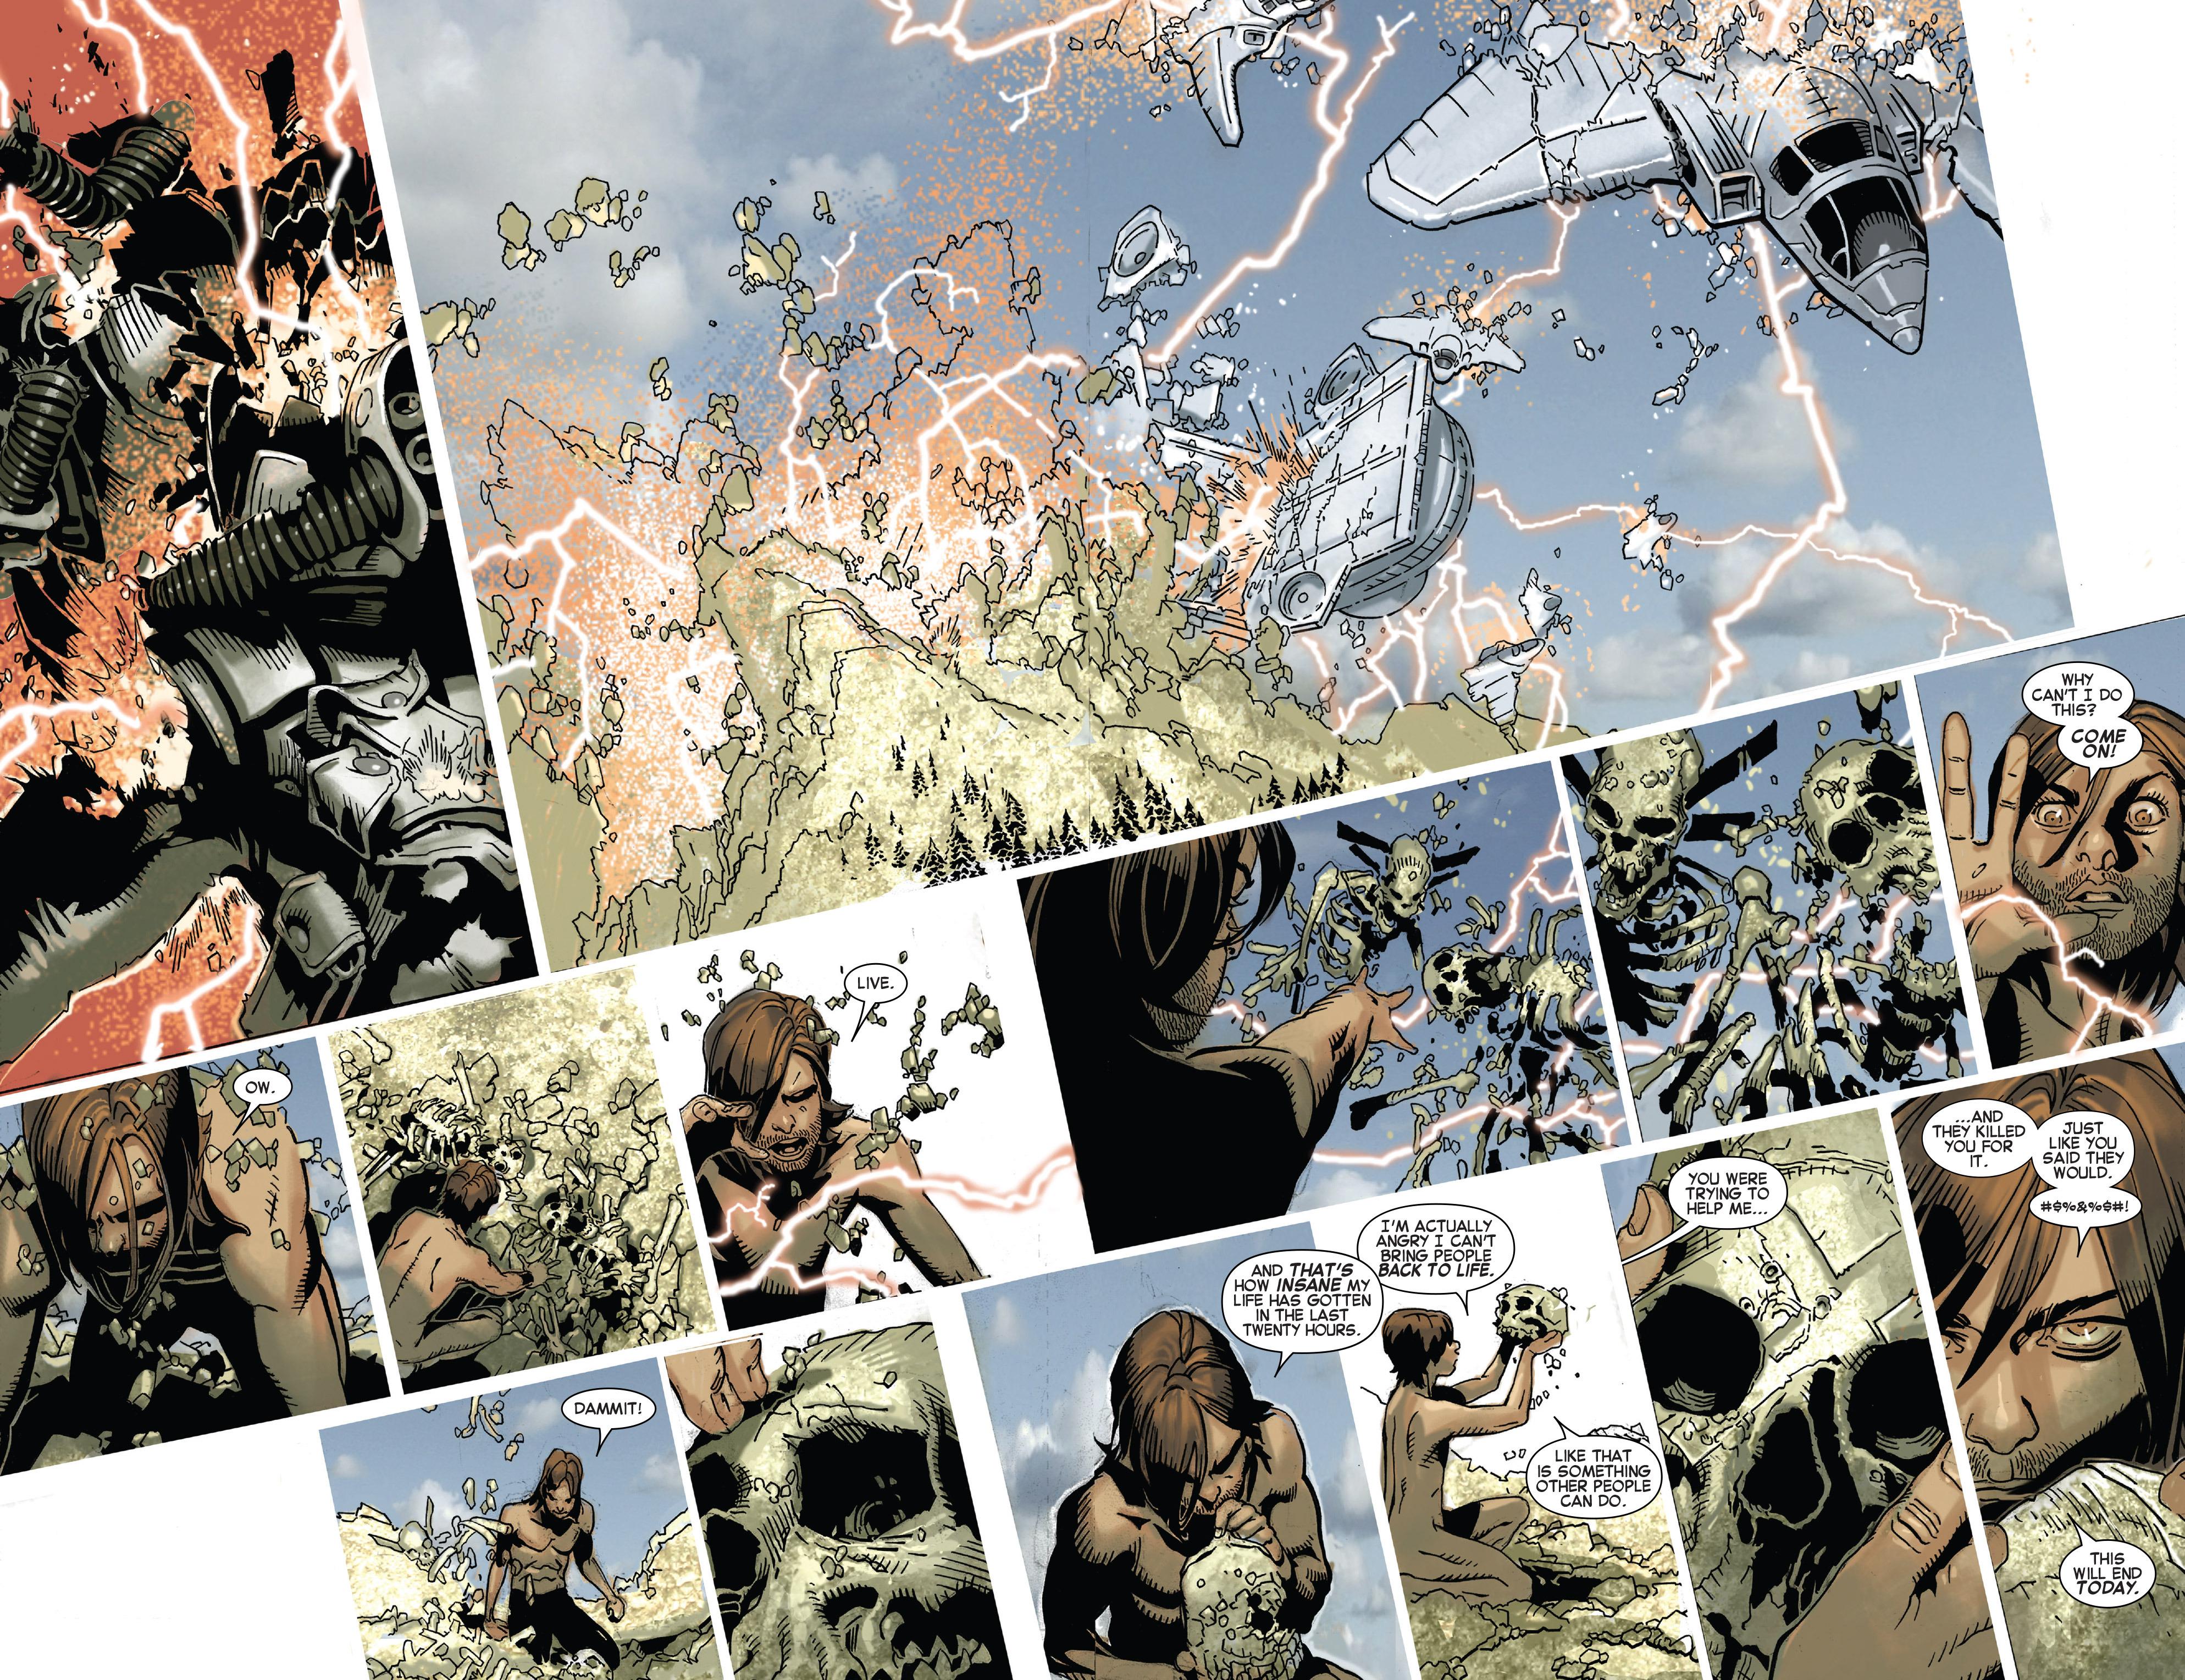 Read online Uncanny X-Men (2013) comic -  Issue # _TPB 5 - The Omega Mutant - 85